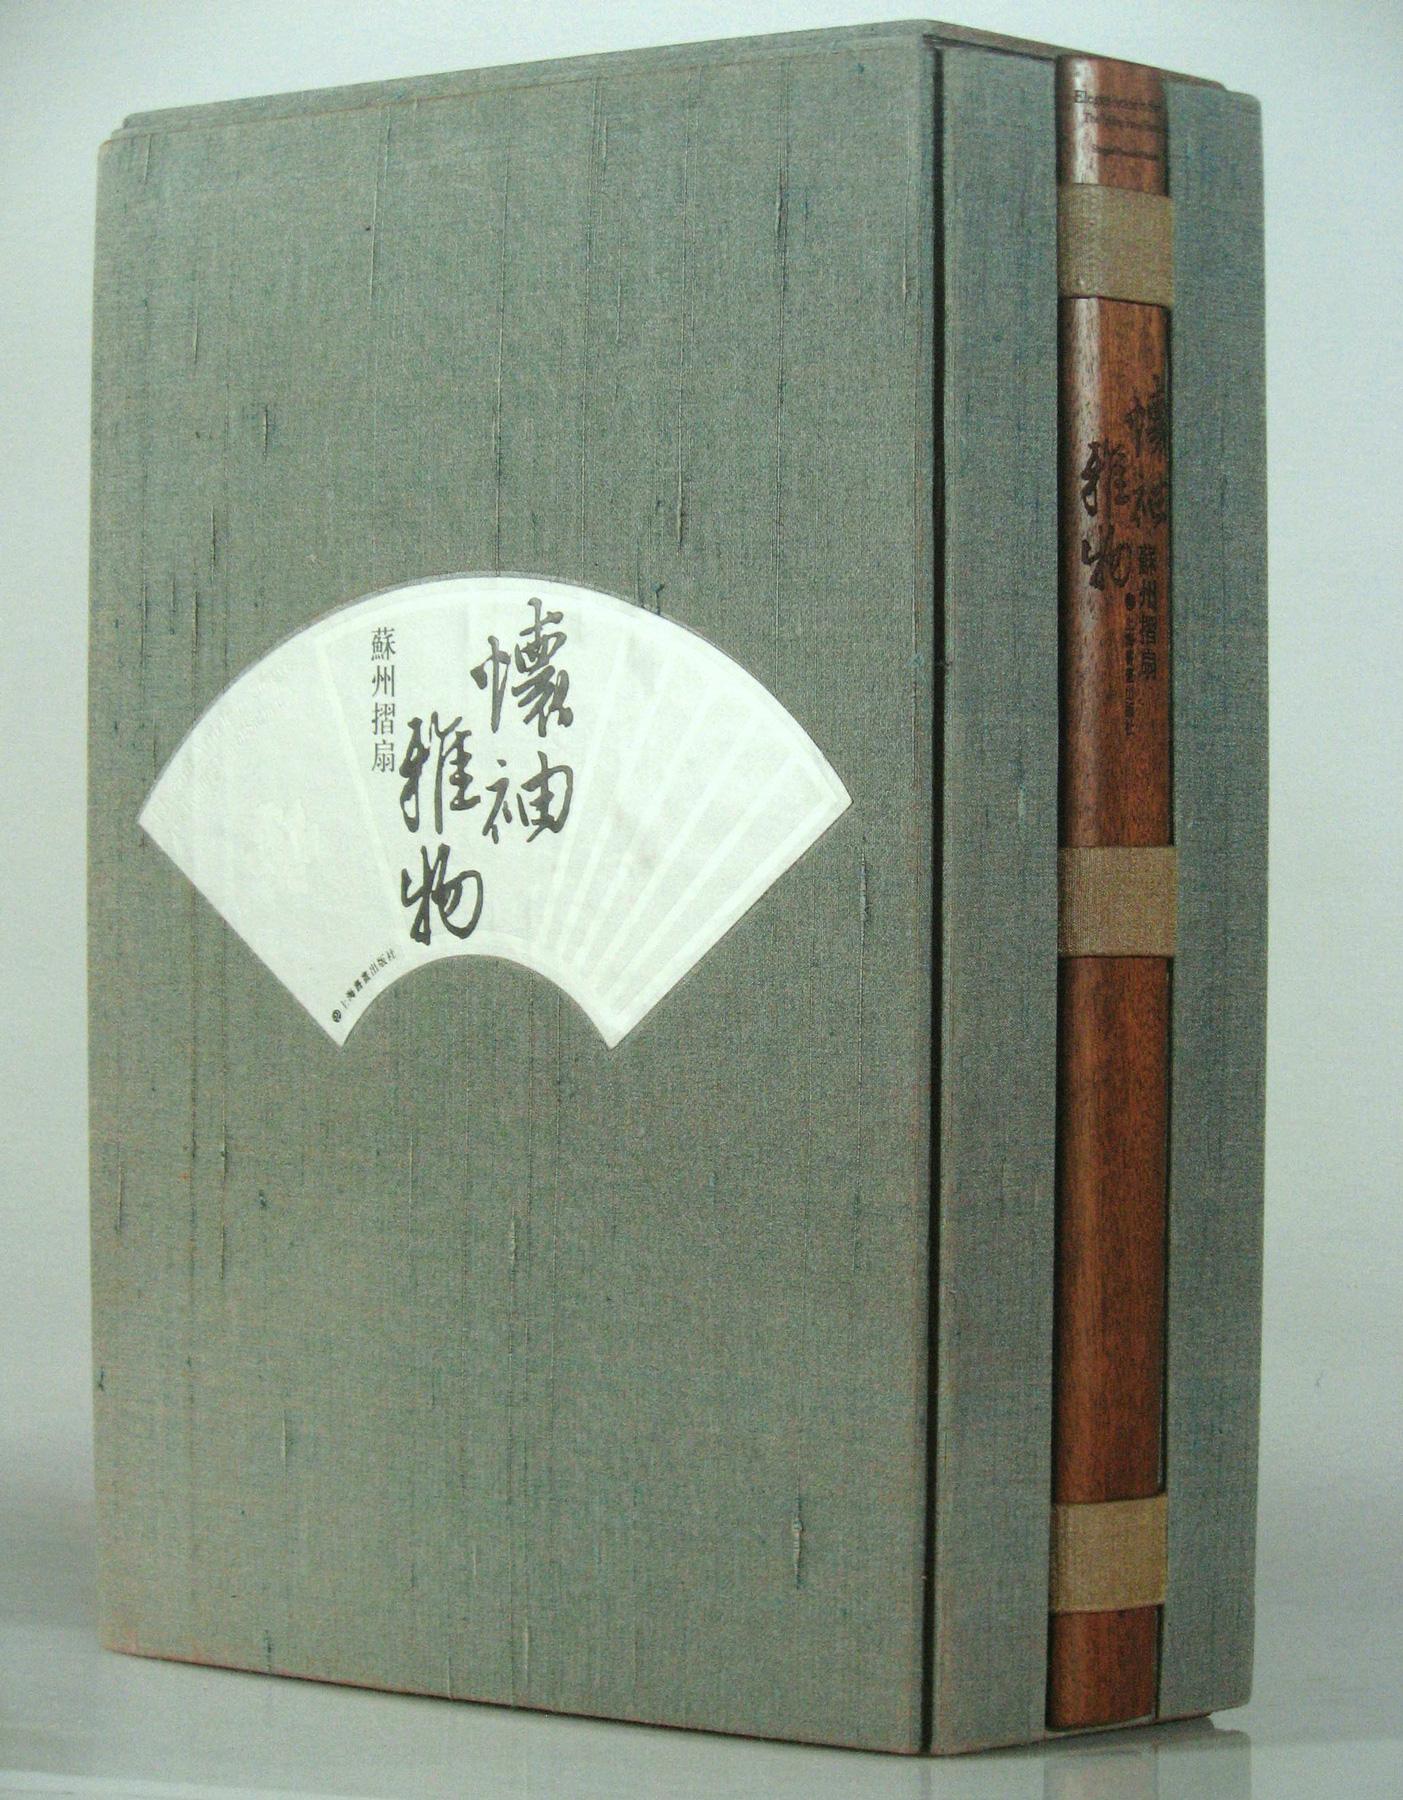 Suzhou zheshan 蘇州摺扇. Elegant Article in Sleeve. The Folding Fan of Suzhou